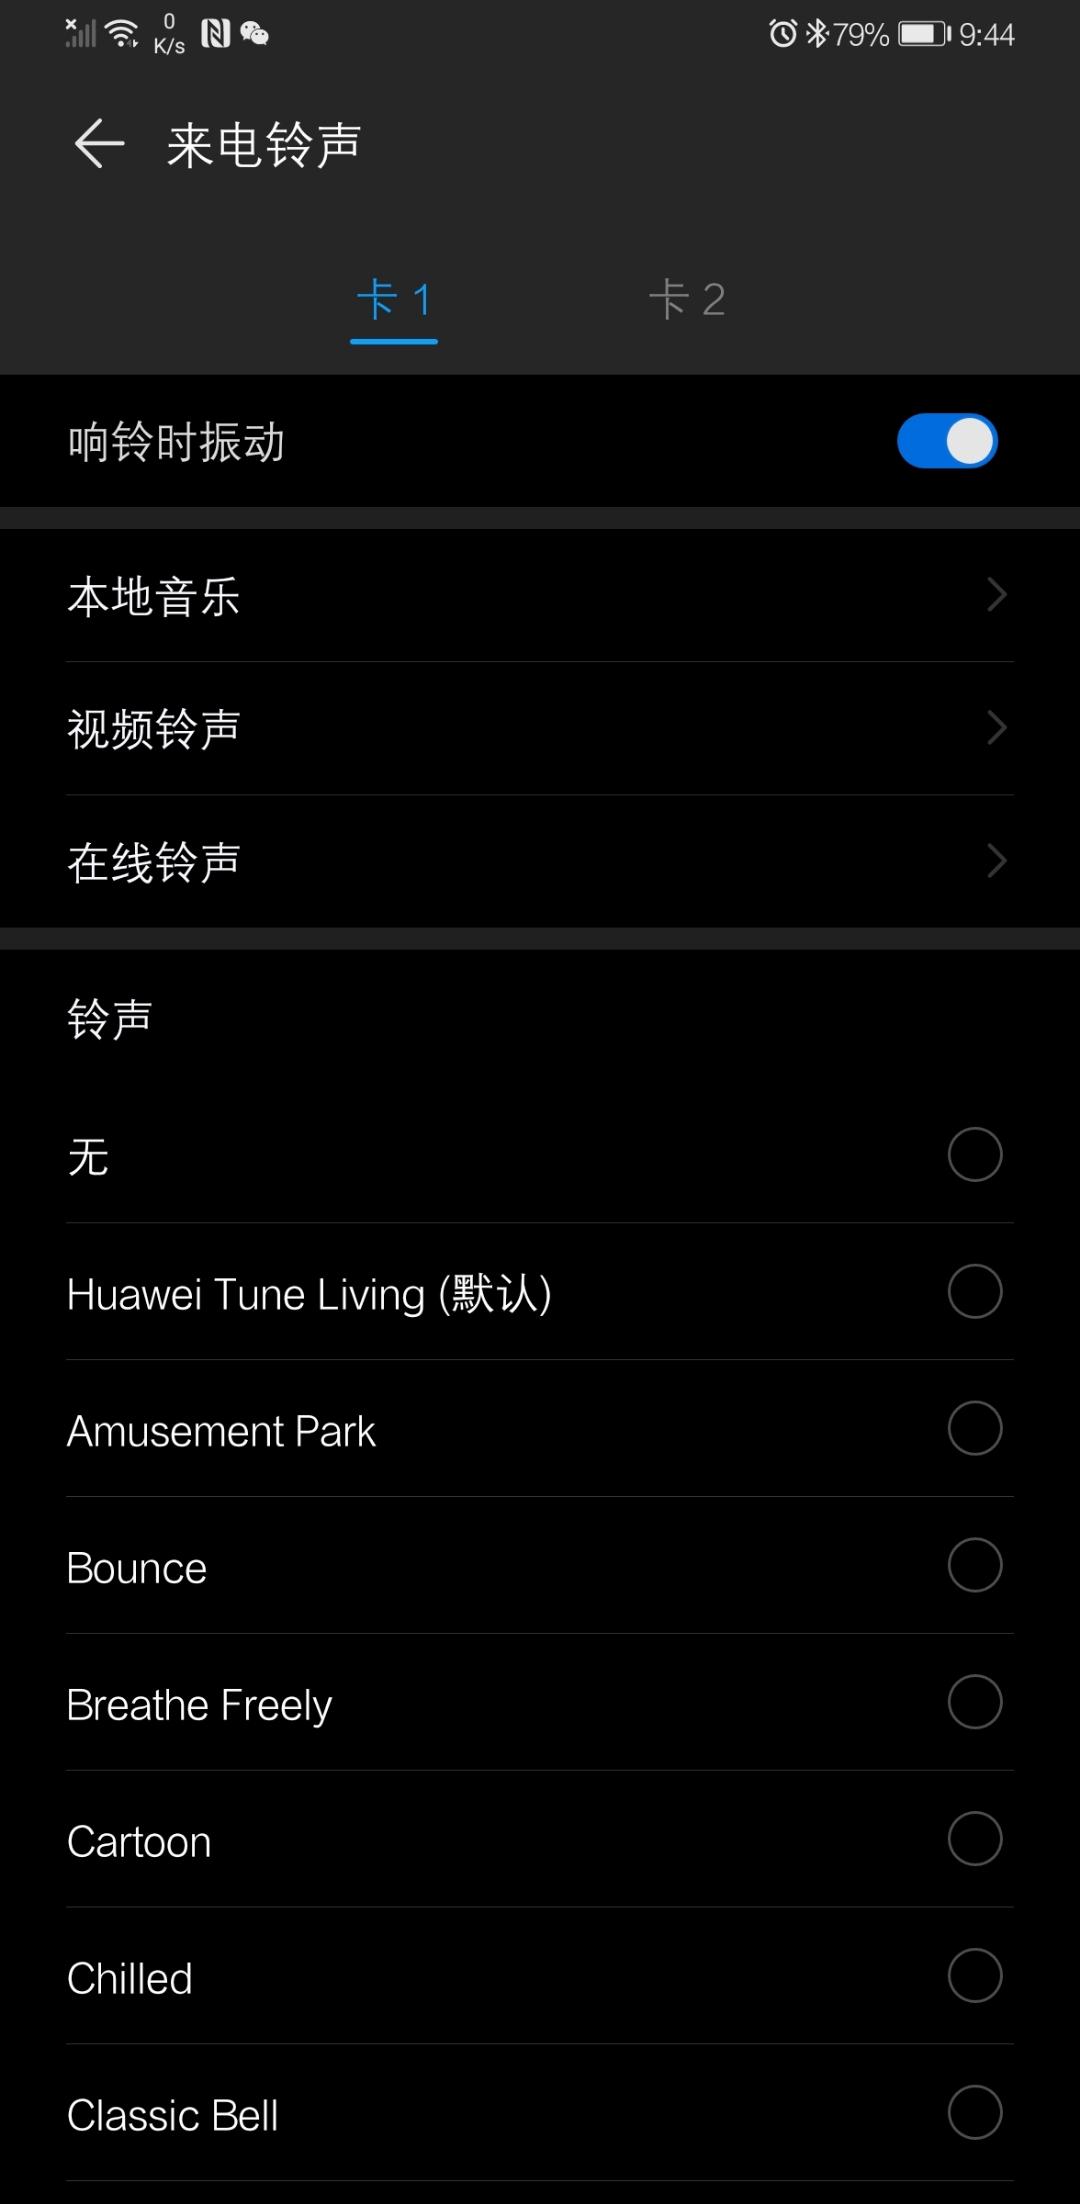 Screenshot_20201022_214409_com.huawei.android.thememanager.jpg